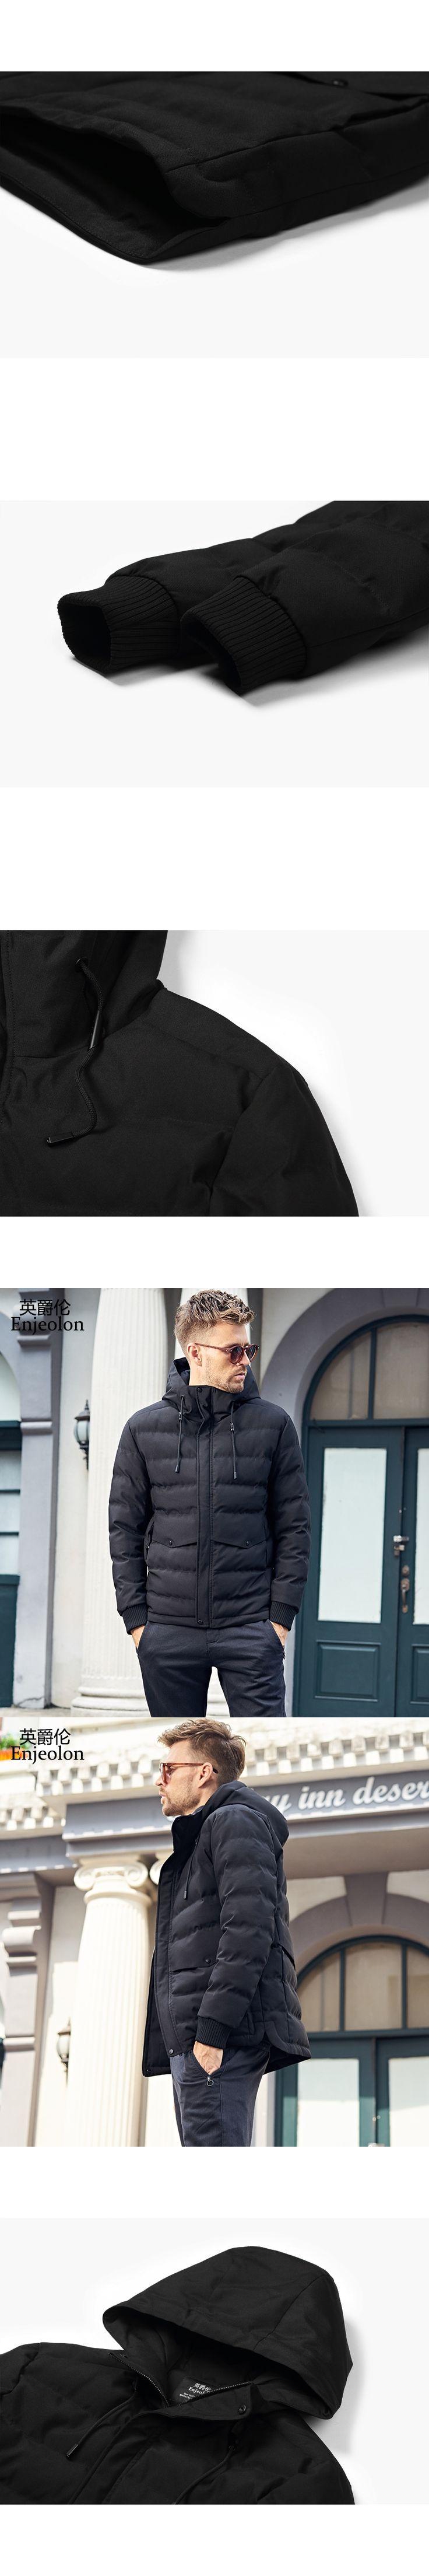 Enjeolon Brand Cotton Padded Jacket coat Men black Parka hoodies coat Thick Quilted fashion plus size 3XL Coat Men MF0299